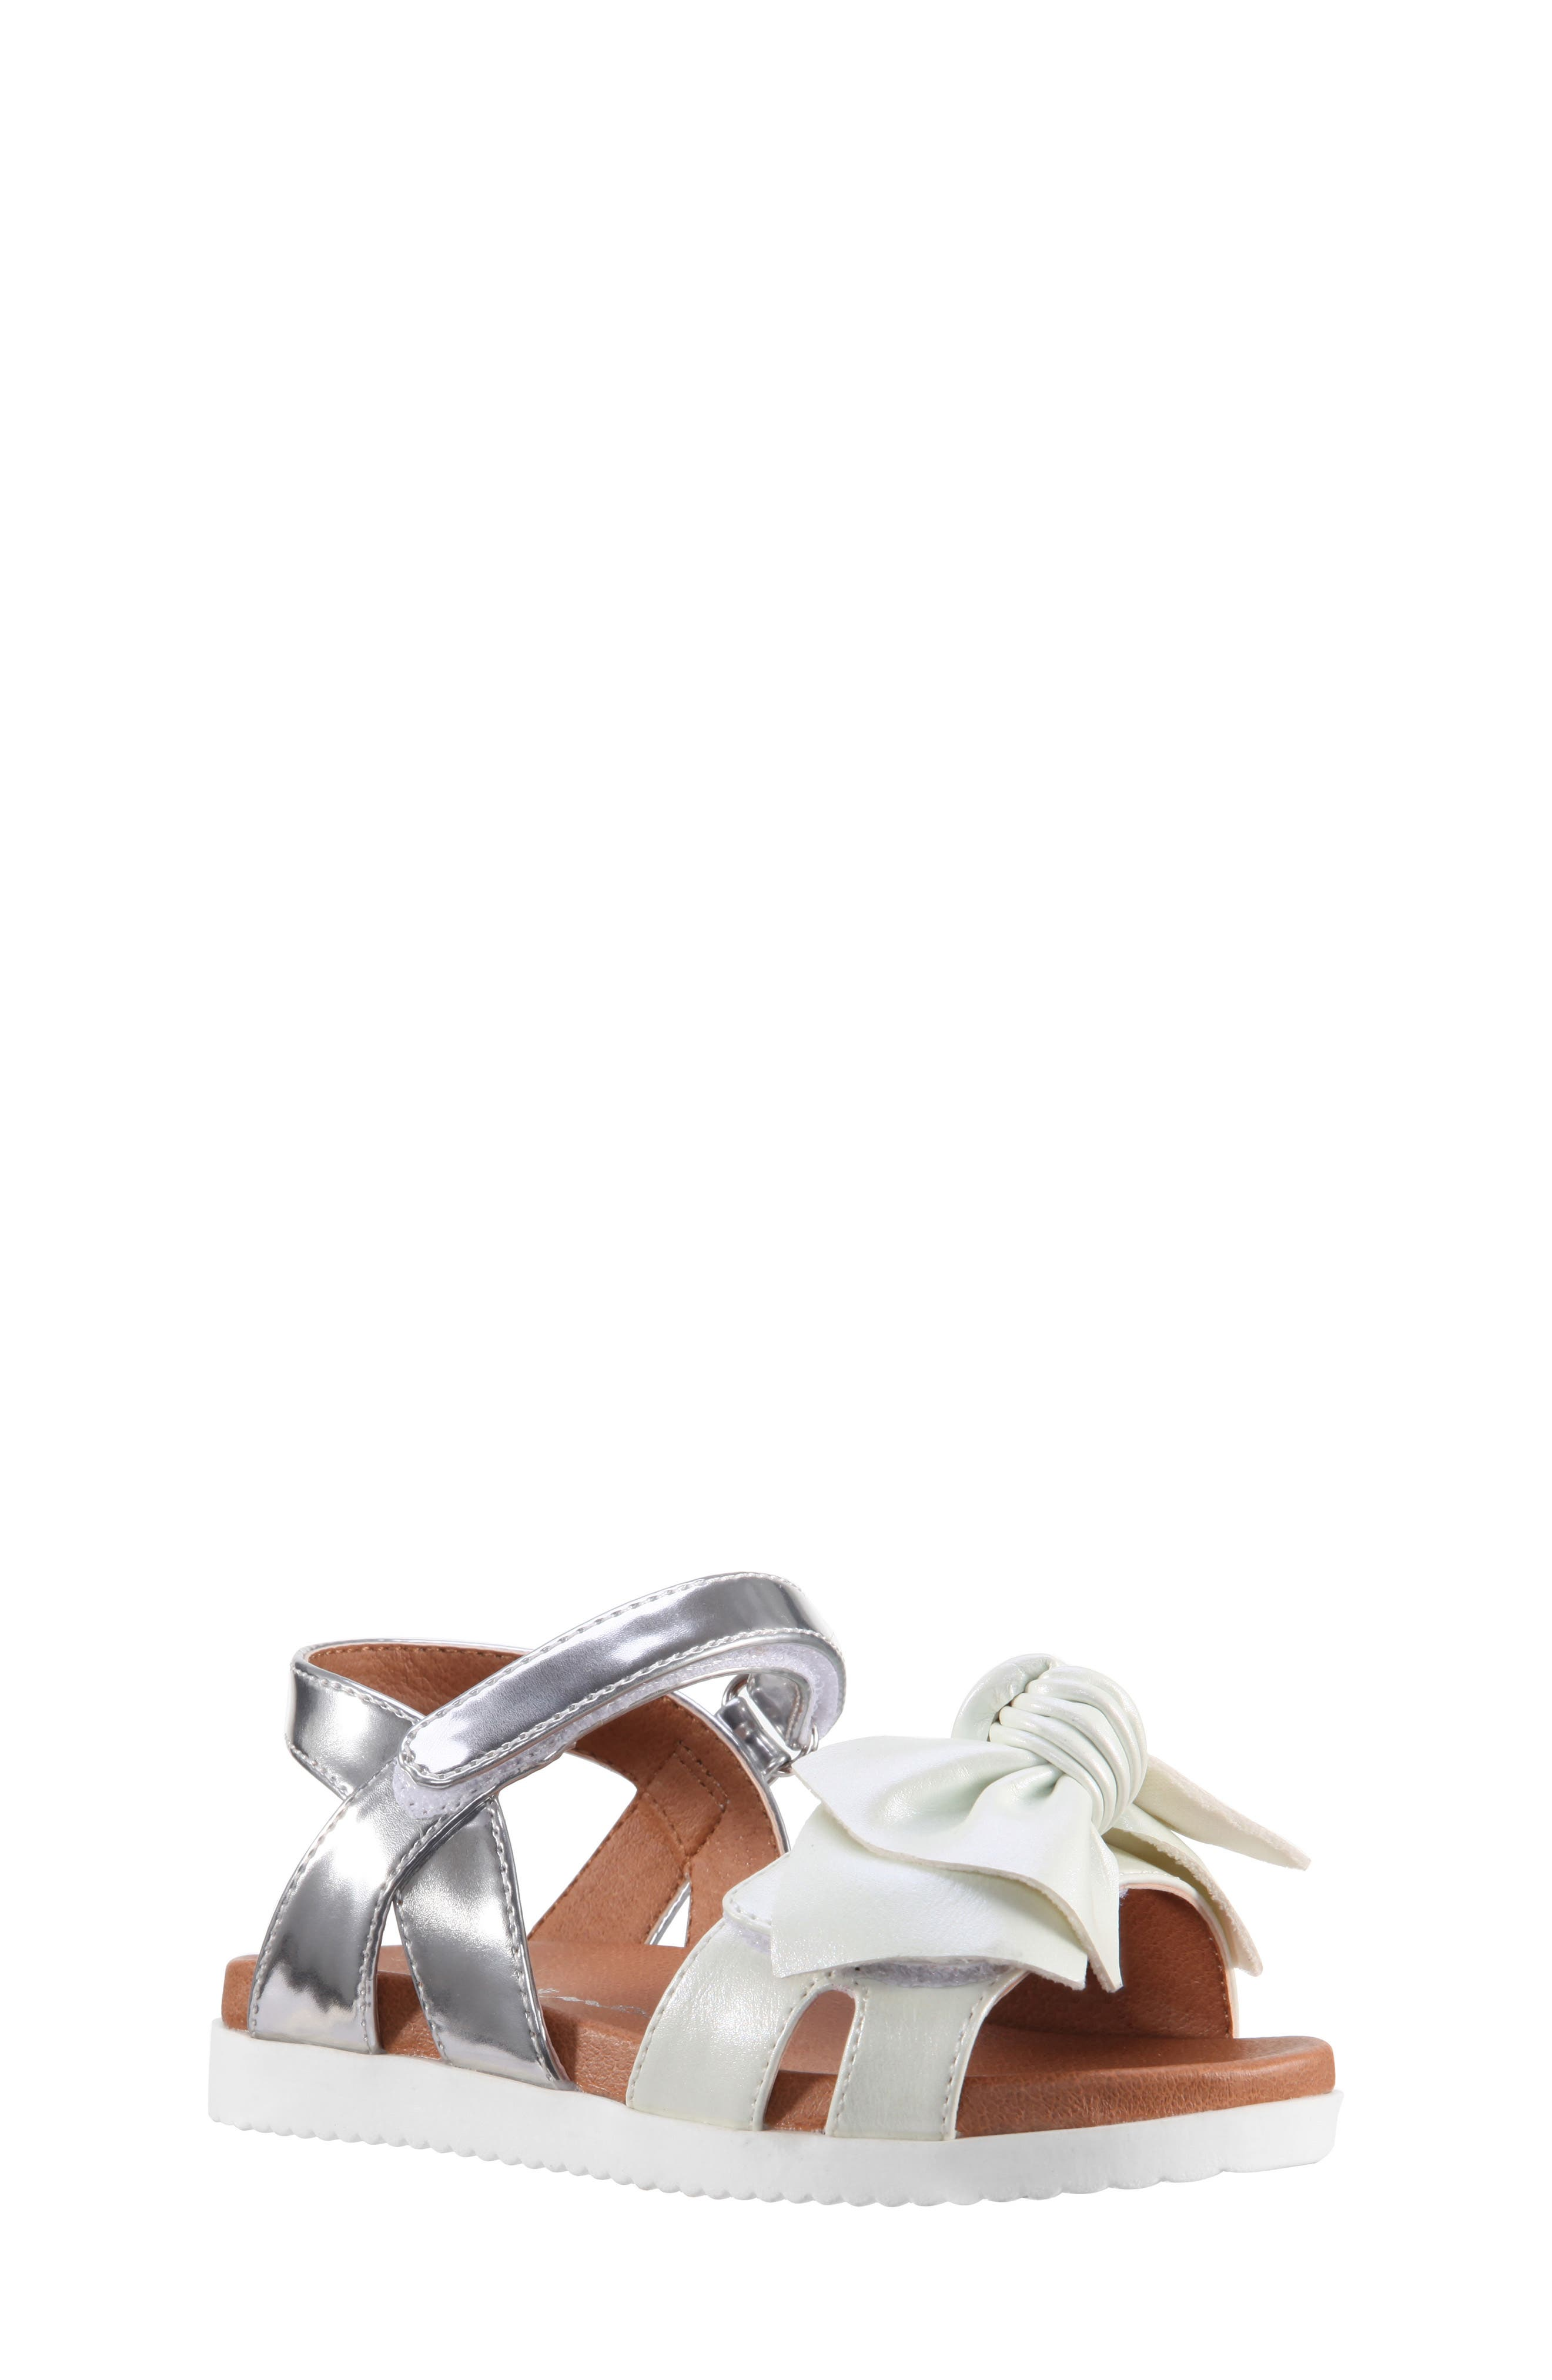 Kaitylyn Bow Sandal,                             Main thumbnail 1, color,                             White Metallic/ Silver